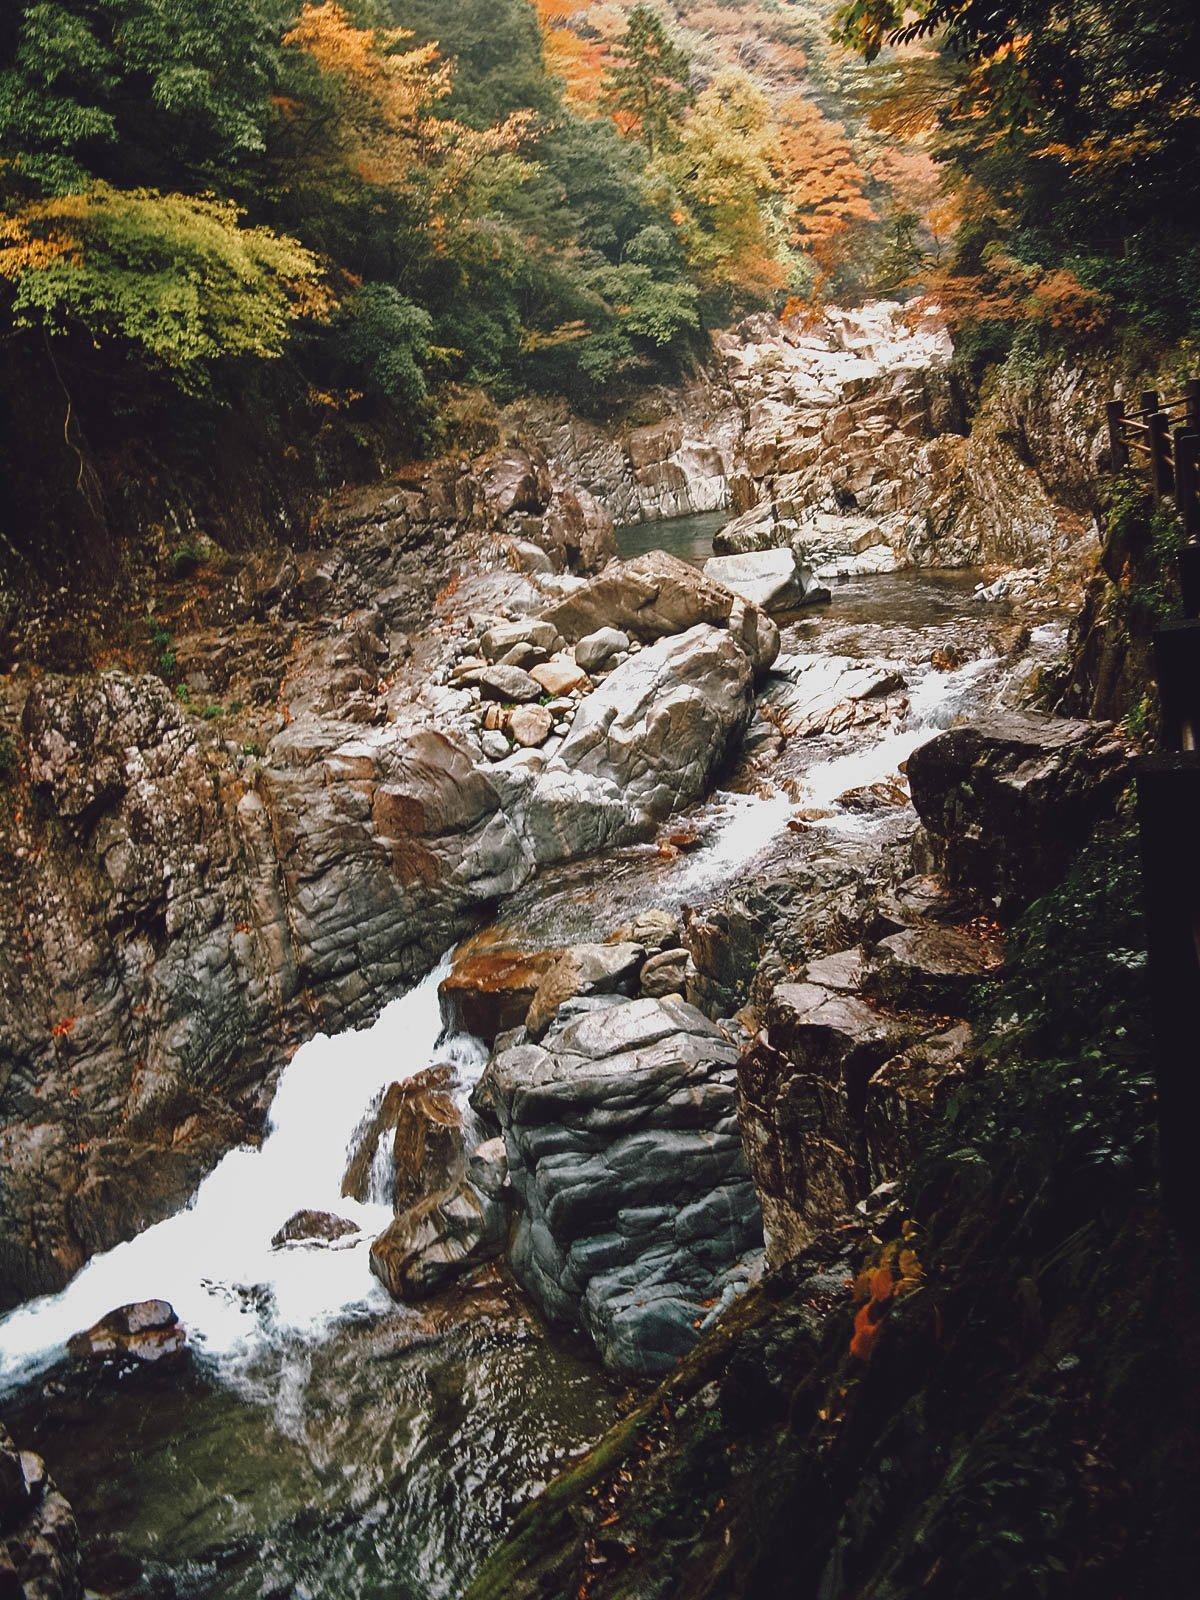 Stream in Sandankyo Gorge